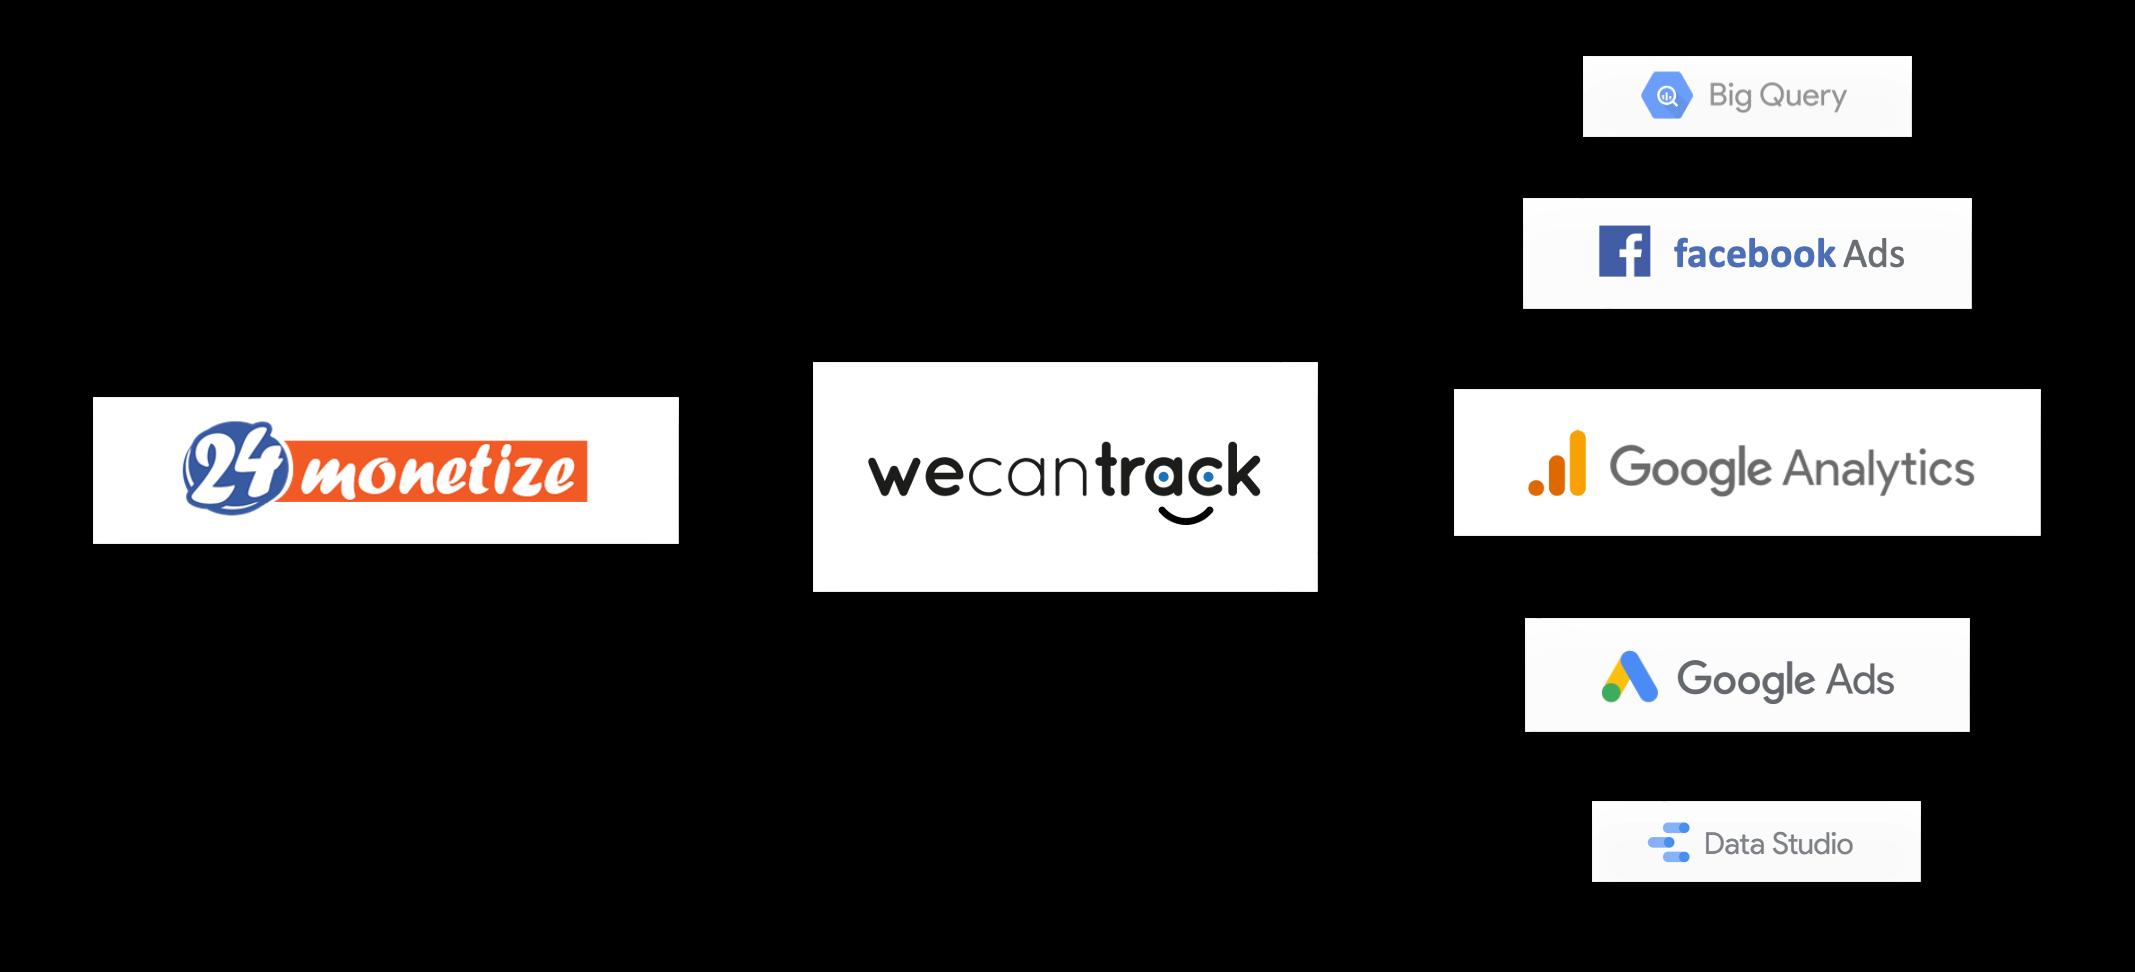 connecting-24monetize-via-postback